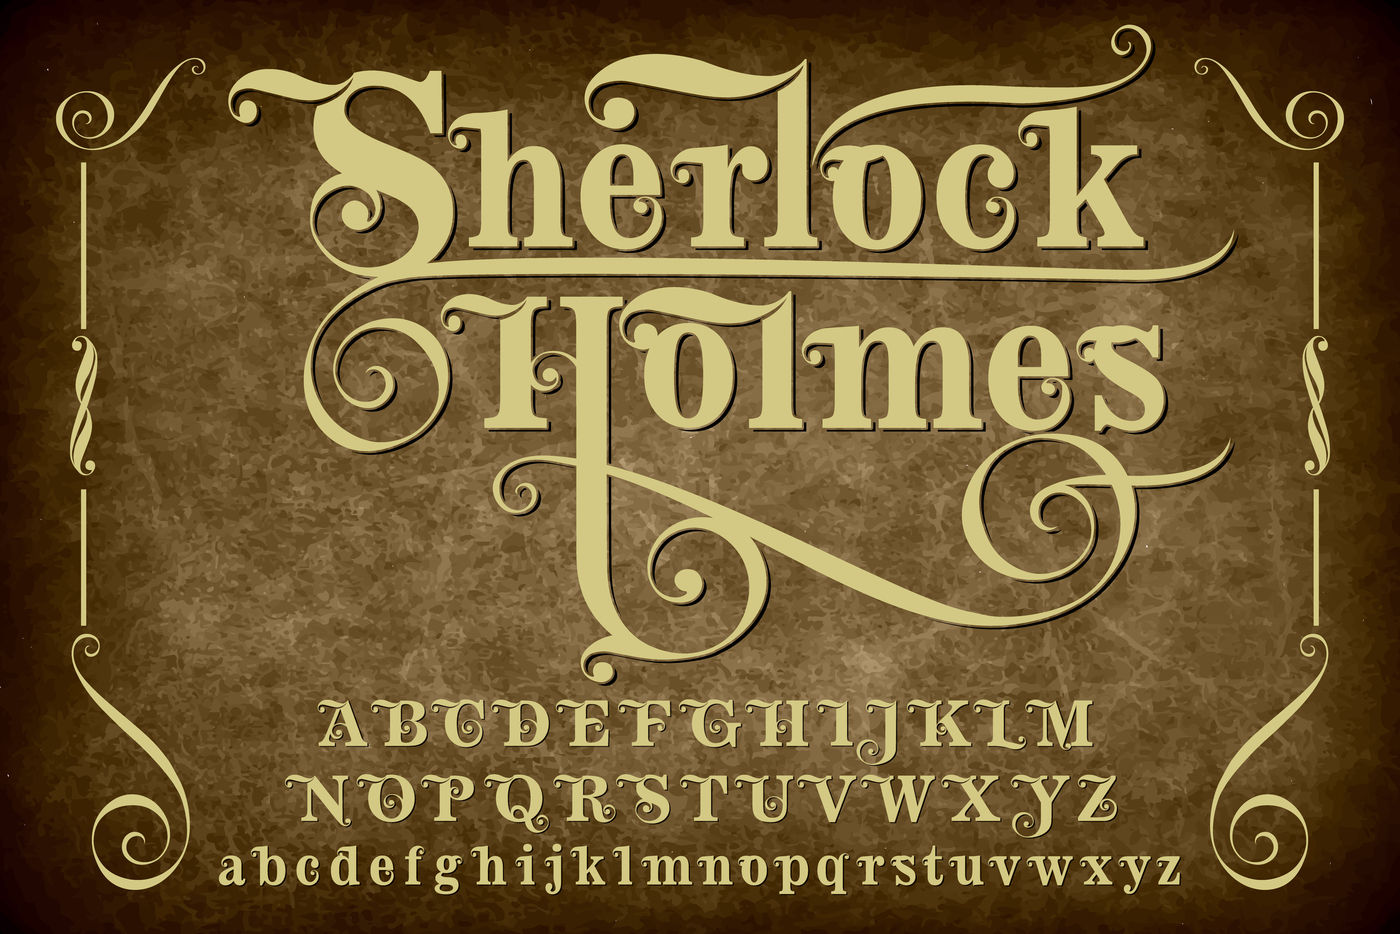 Sherlock Holmes Vintage Vector Typeface Letters By Vintage Font